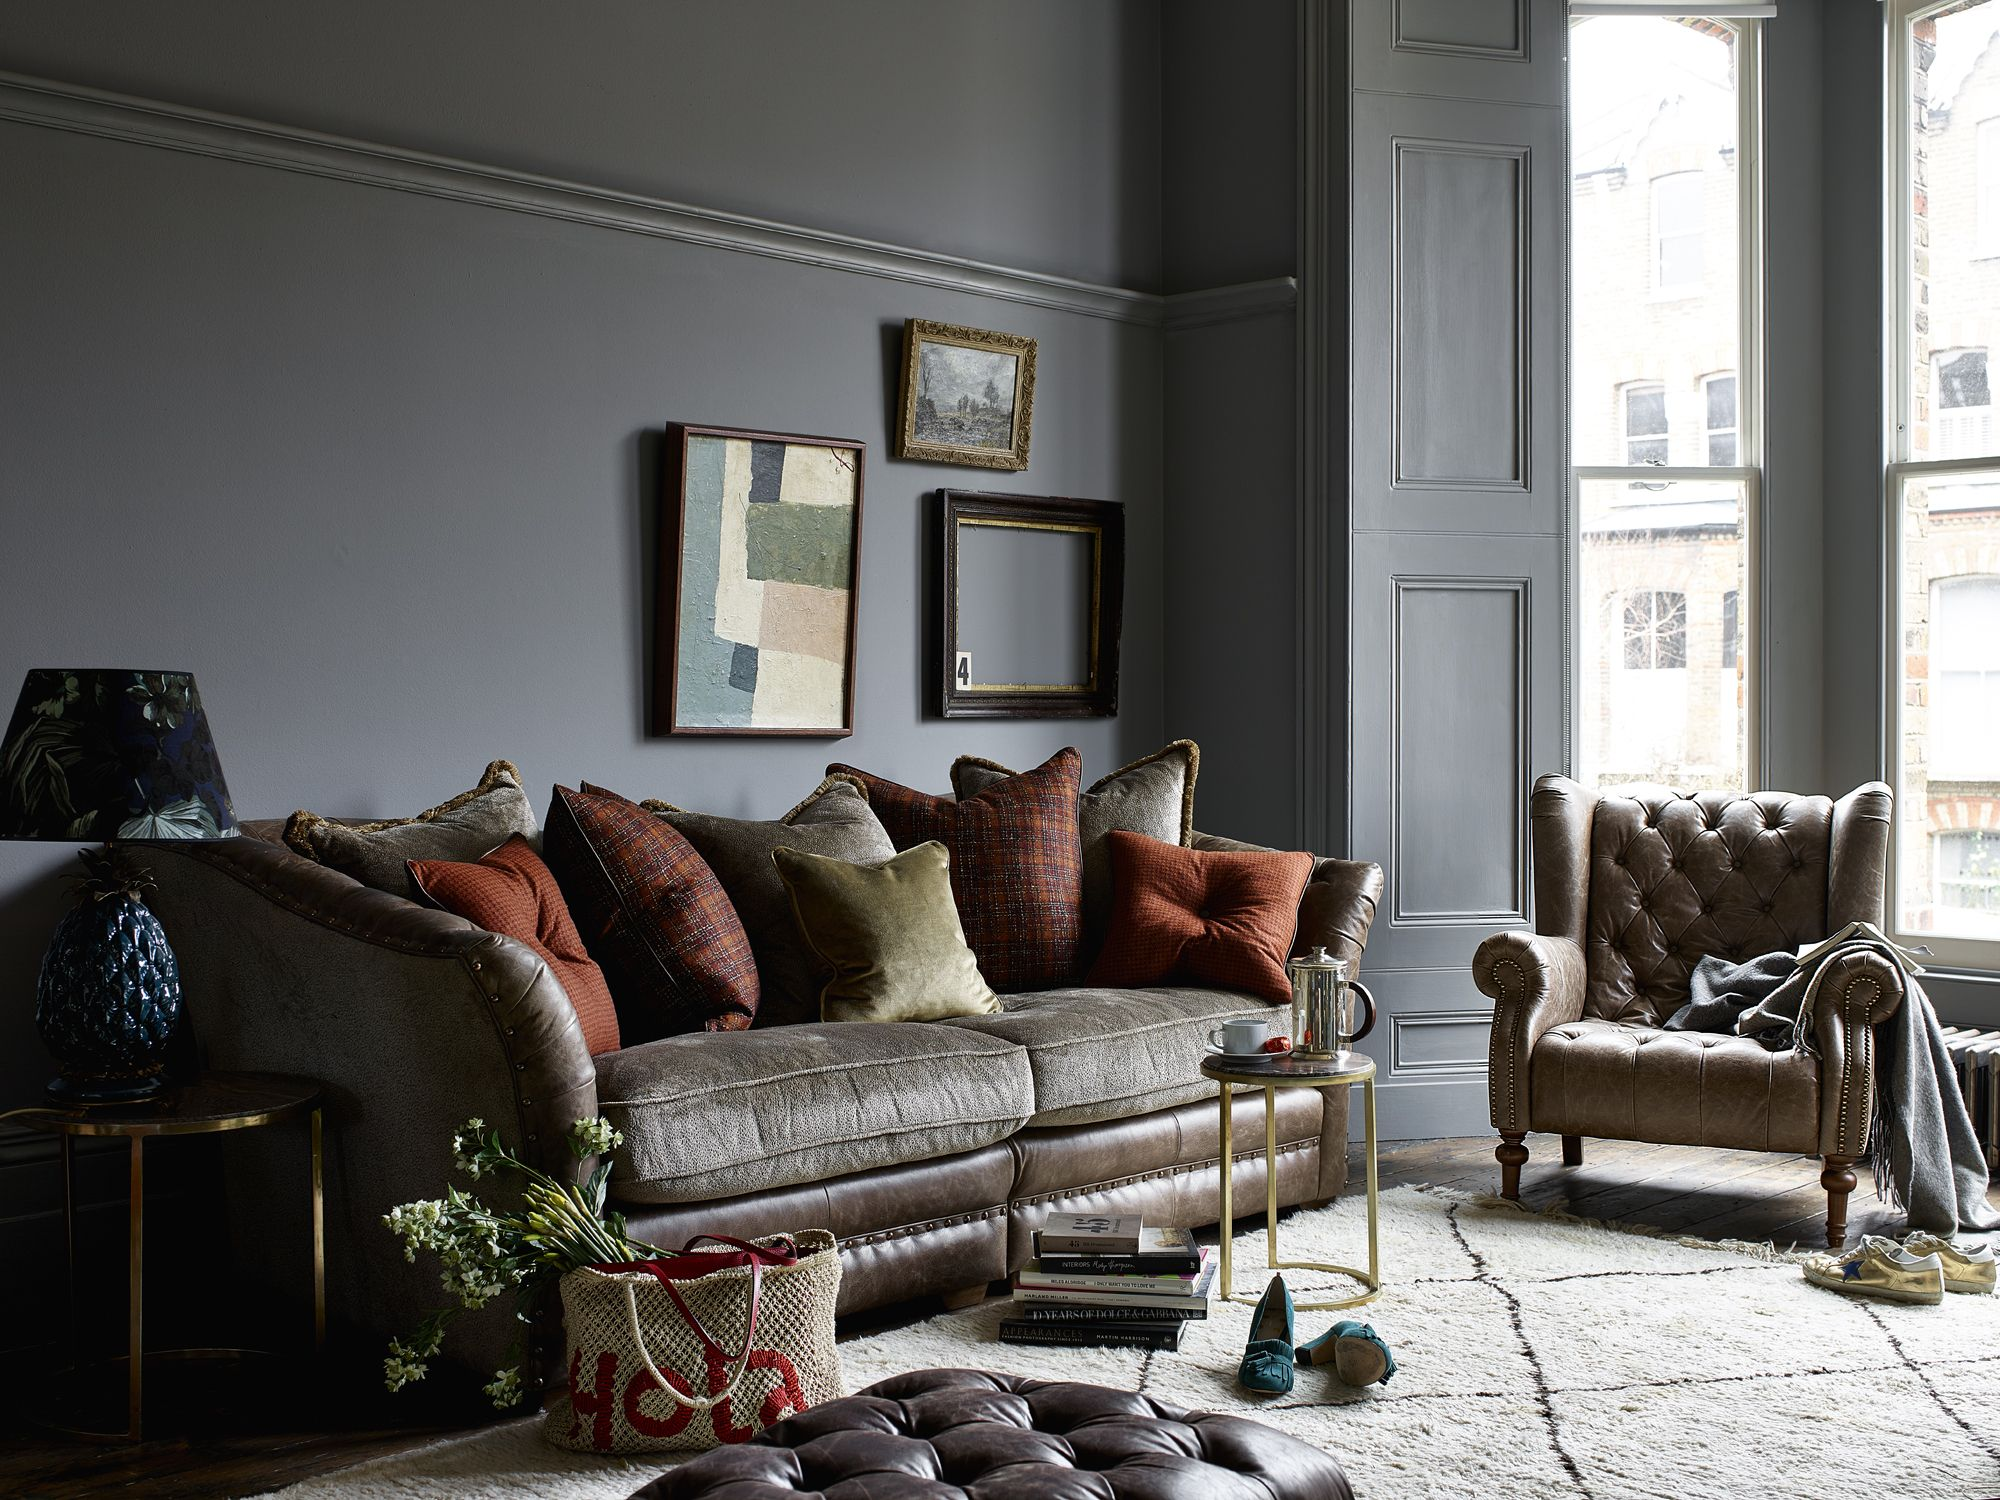 Alexander James Henderson Grand Split Sofa Leather Satchel Biscotti With Fabric Option 1 With Dark Wood Fee British Sofa Comfortable Sofa Living Room Decor